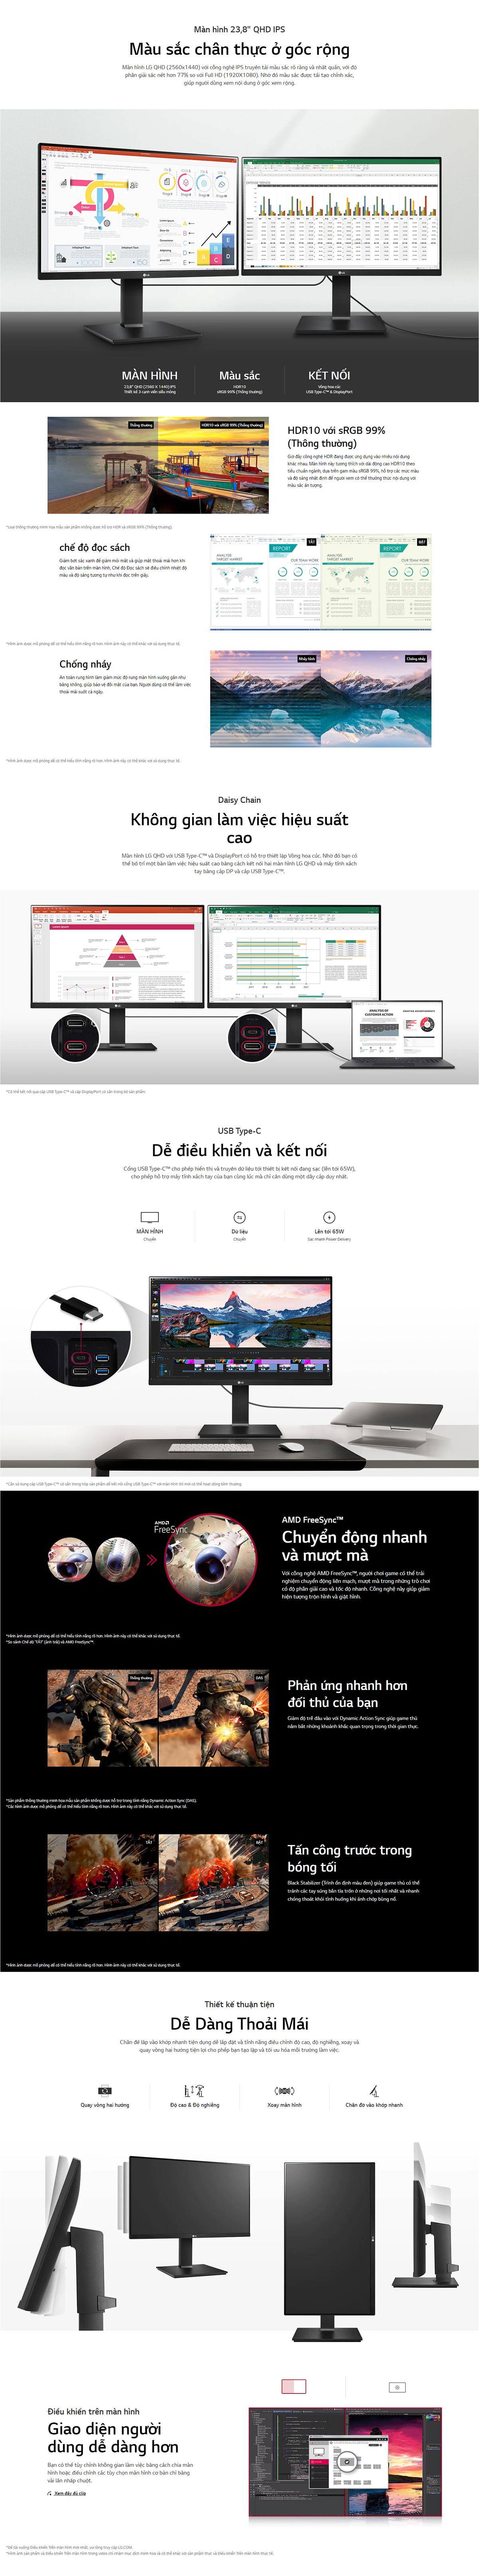 LG 24QP750 B Gaming Monitor Details